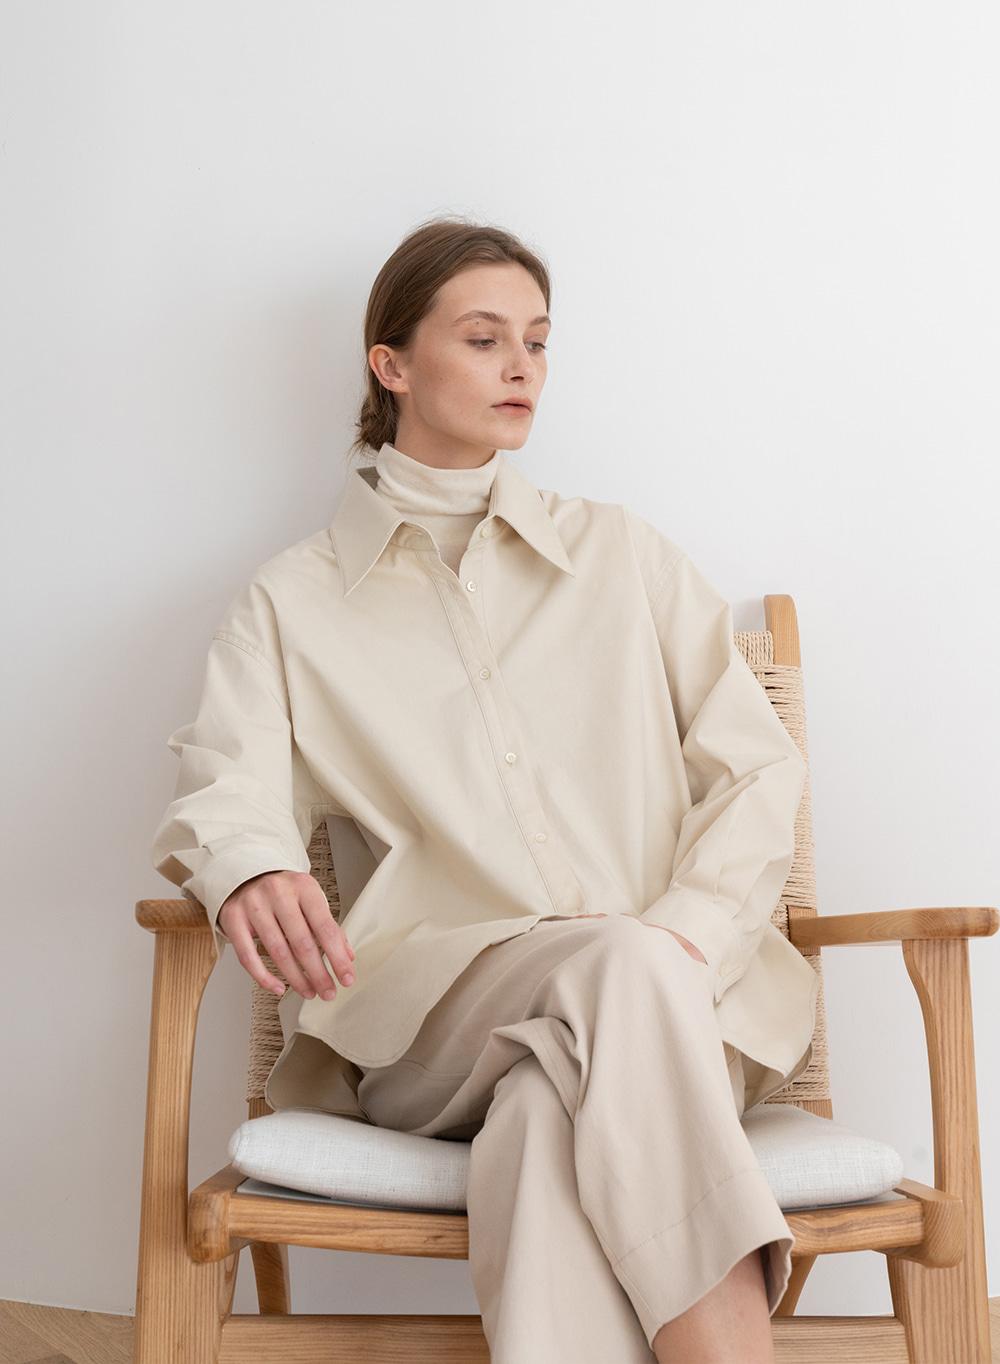 [ESSENTIAL] 포플린 Poplin Shirt Cream